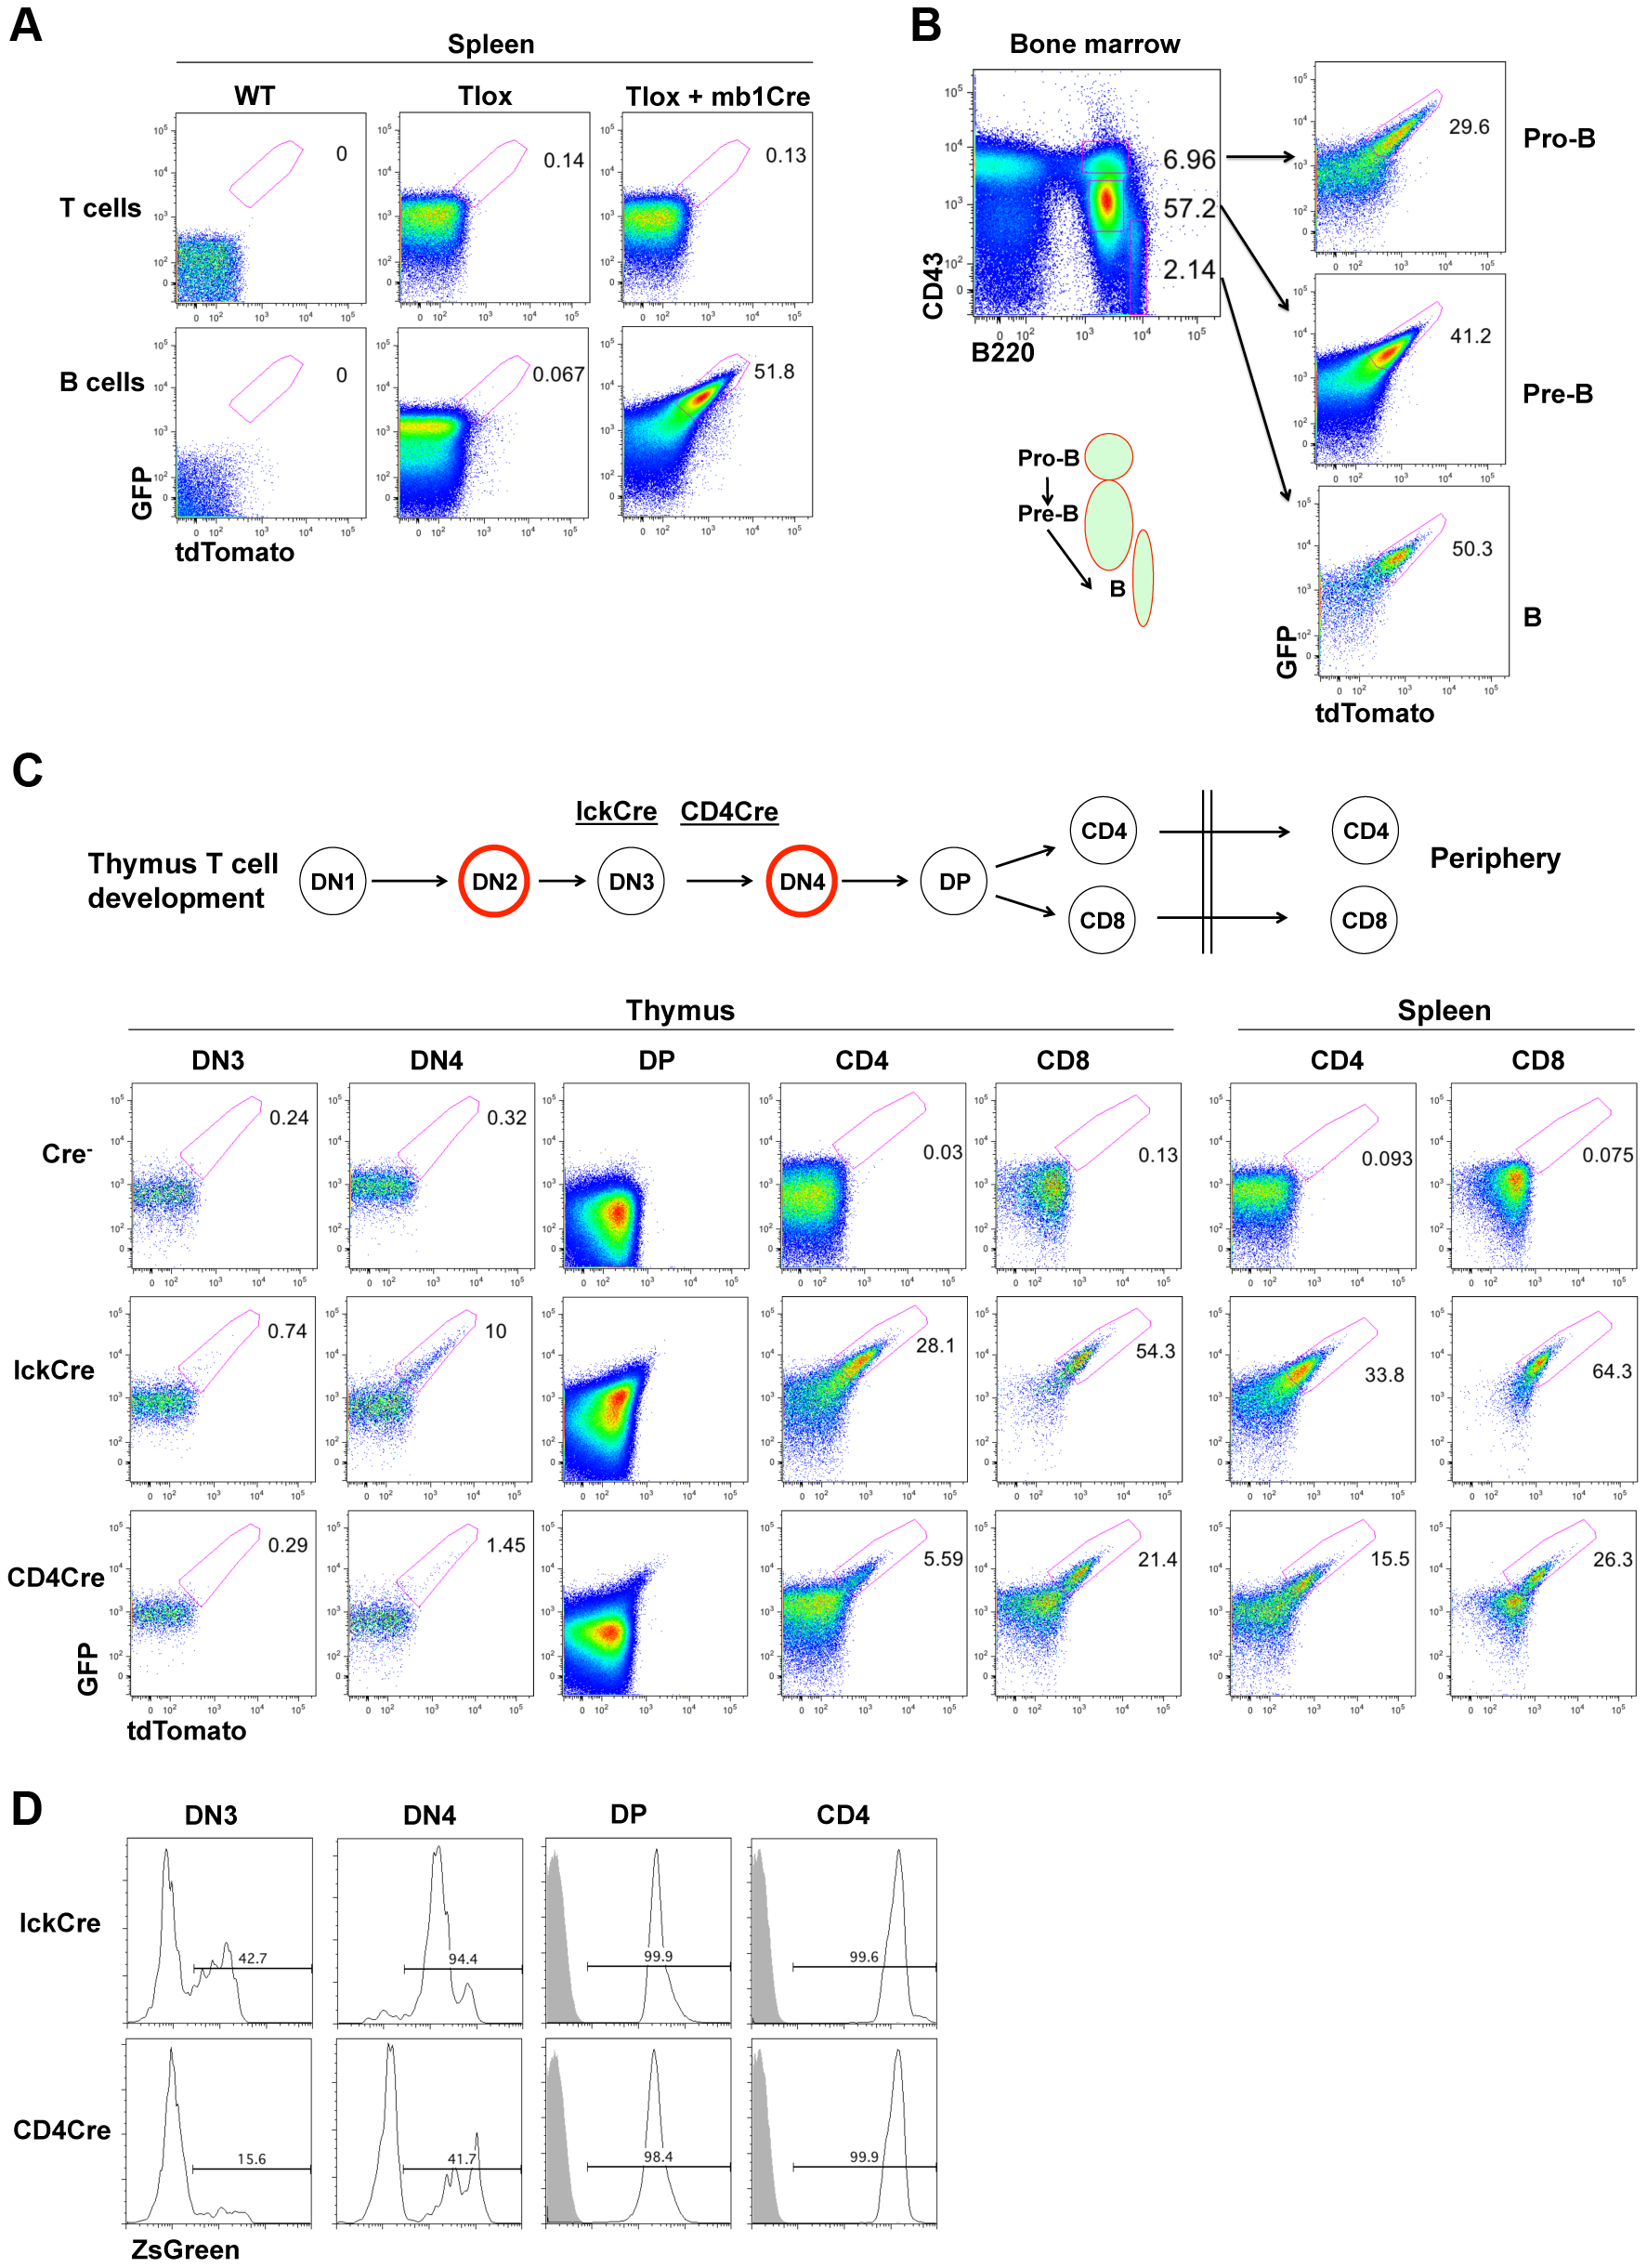 Tlox tracking lymphocyte proliferation <i>in vivo</i>.